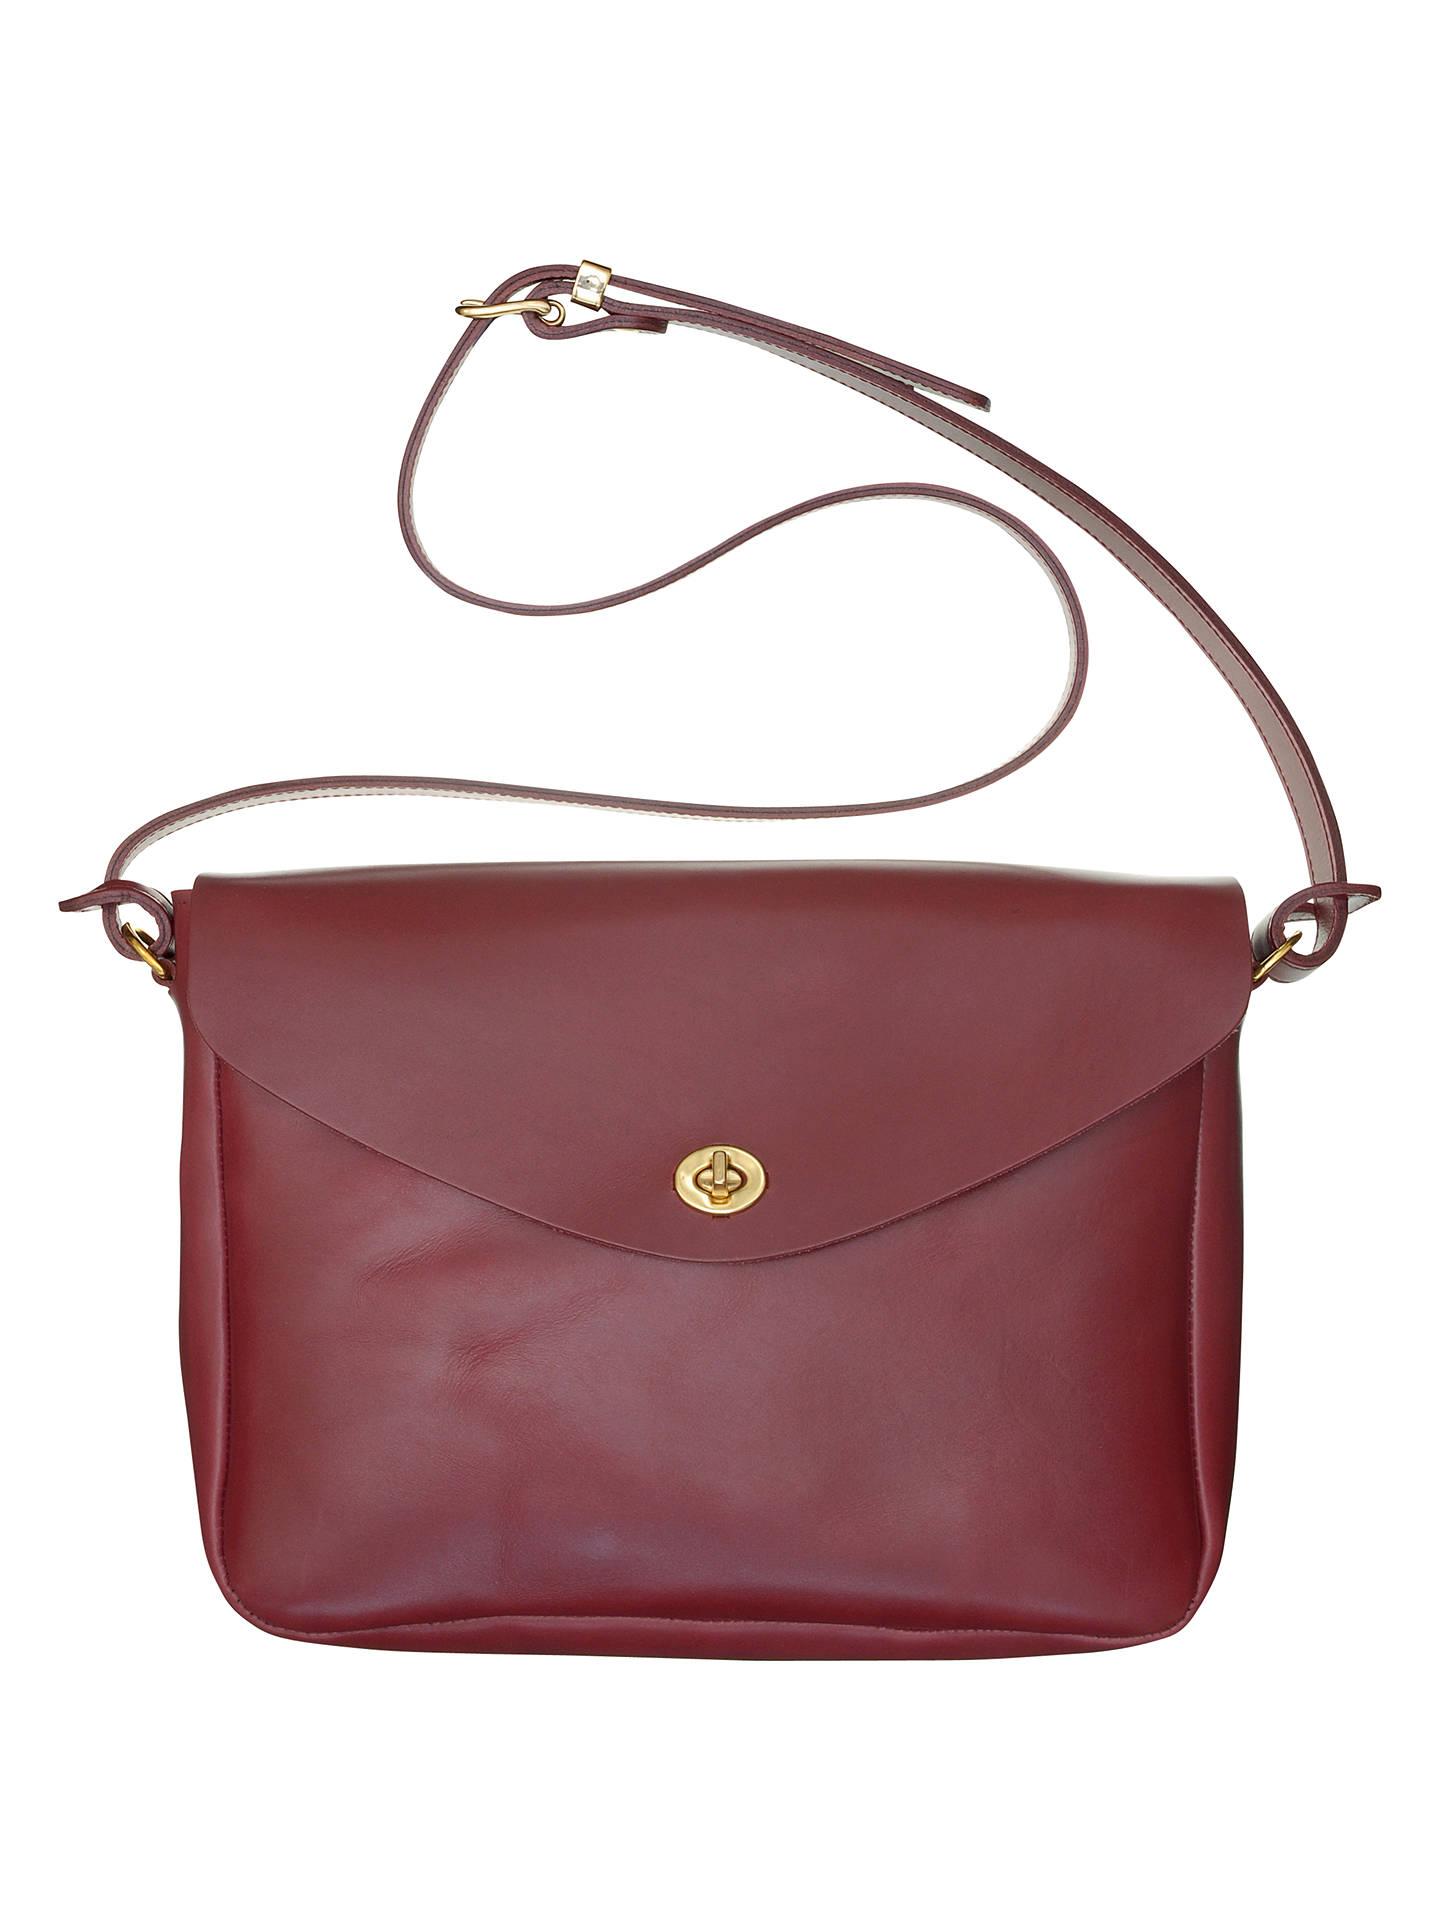 Mimi Berry Frank Leather Medium Shoulder Bag Bordeux Online At Johnlewis